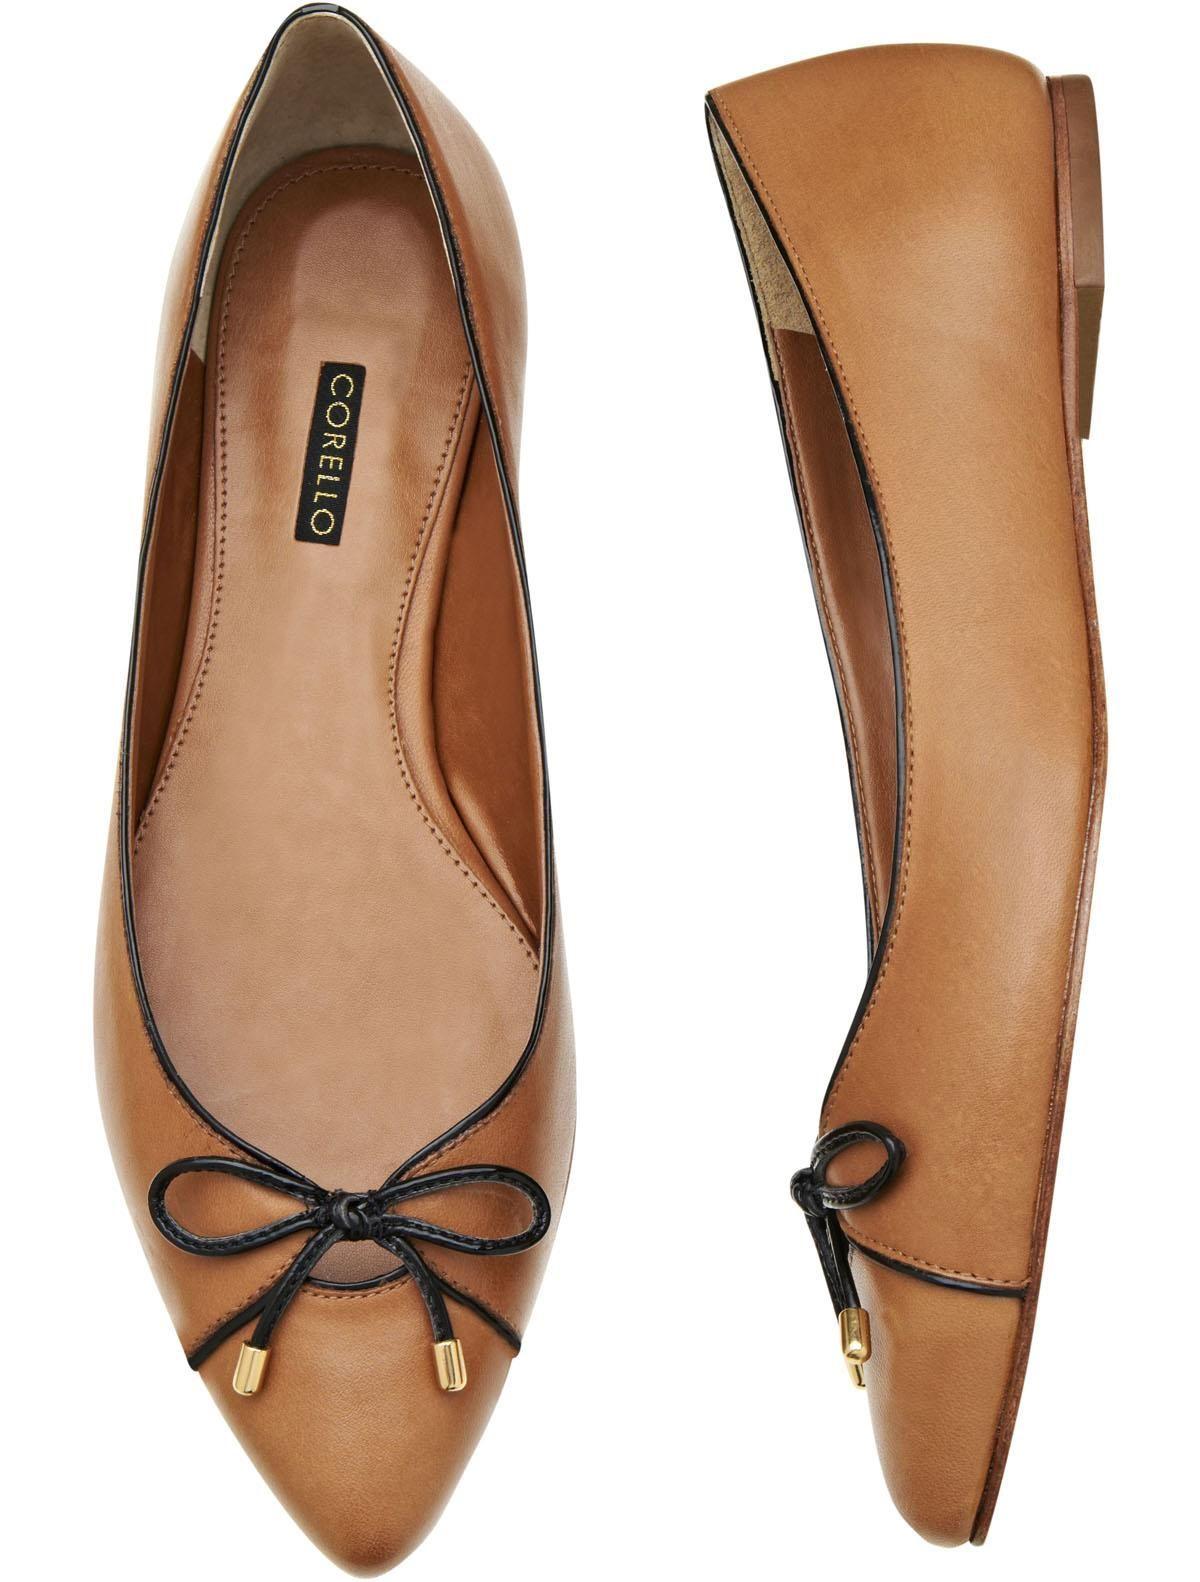 7ada55341 Sapatilha Bico Fino Couro | Feminino | Sapatilhas, Sapatos ...